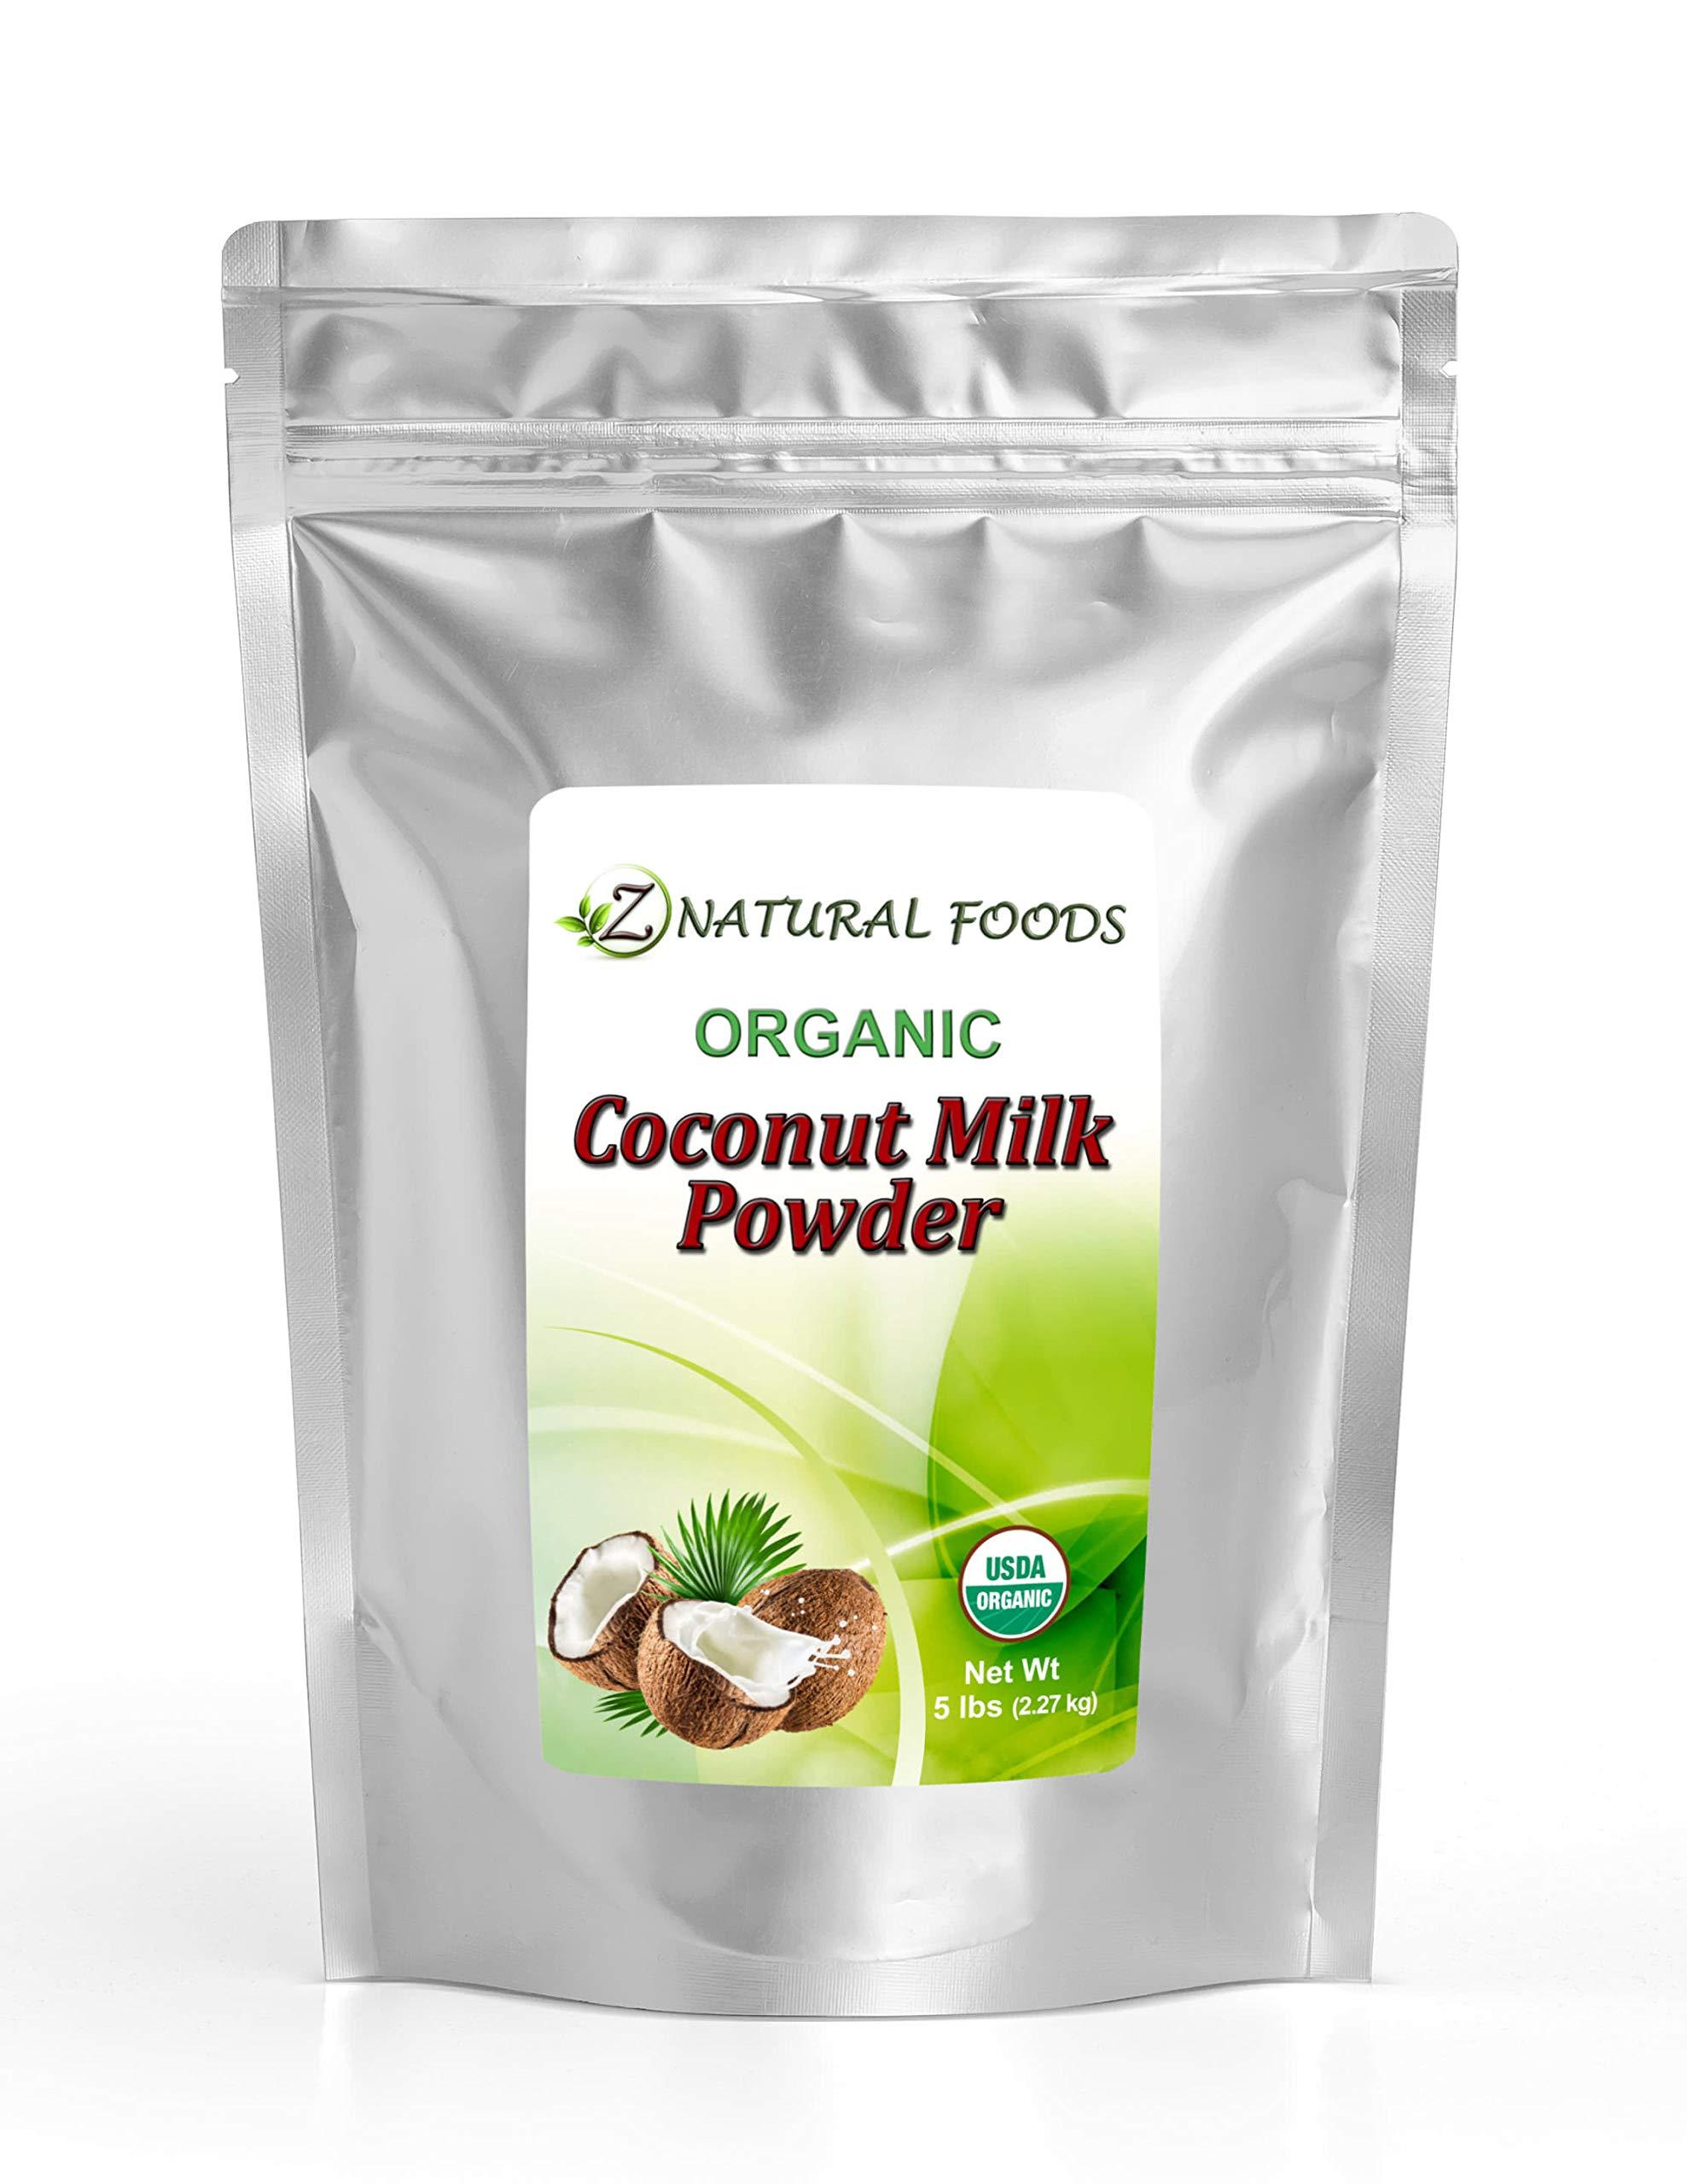 Z Natural Foods - Organic Coconut Milk Powder - Kosher, Vegan, Fresh, Gluten Free, All-Natural, Dairy Free, Non-GMO, Keto, Paleo Diet Friendly (5 lbs)